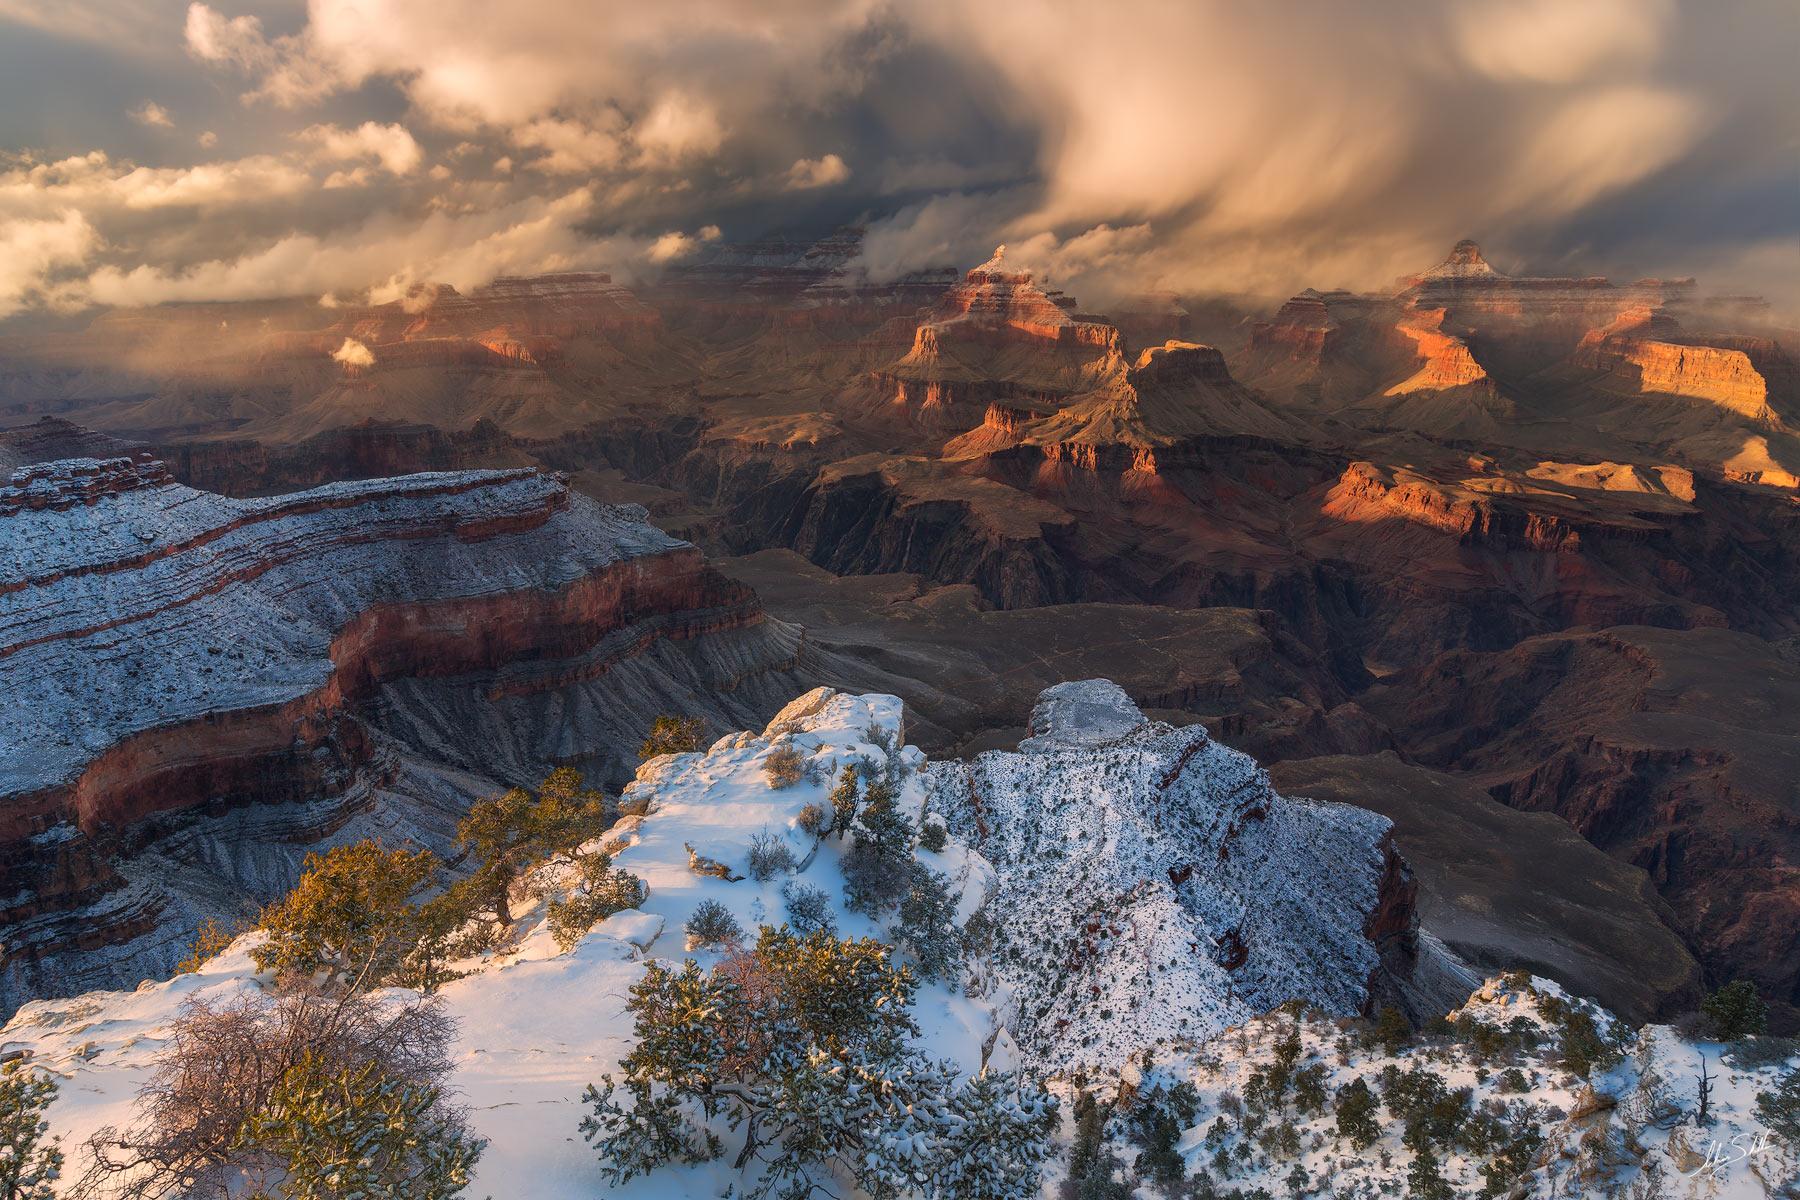 AZ, Arizona, Clouds, Colorado River, Grand Canyon, Grand Canyon National Park, Isis Temple, National Park, Snow, Snow at the Grand Canyon, South Rim, South Rim of the Grand Canyon, Storm, Weather, Win, photo